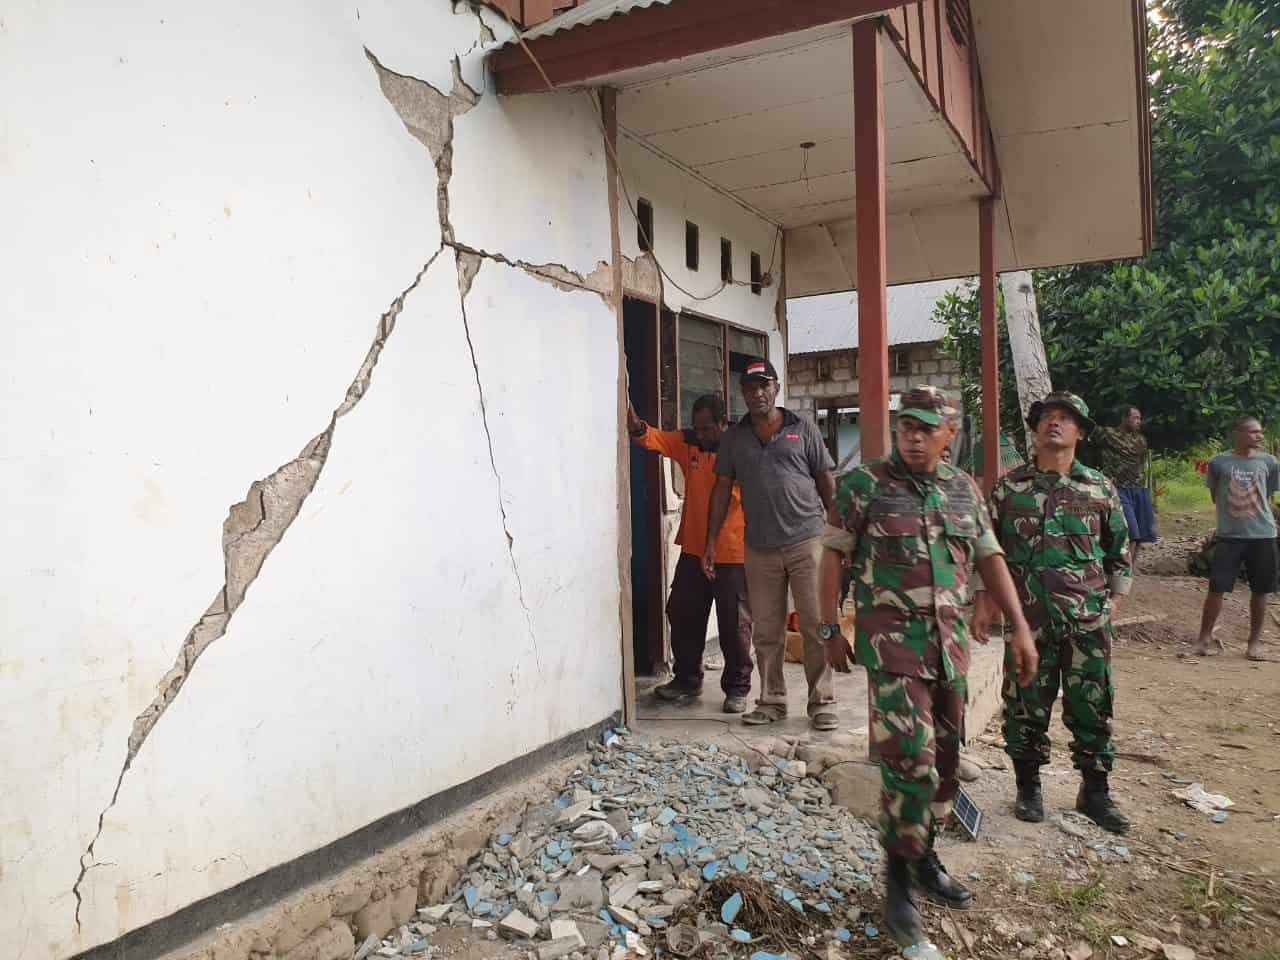 Gempa 6.3 Sr Sarmi Selatan, Kodim 1712 Kirim Bantuan Dan Tim Evakuasi